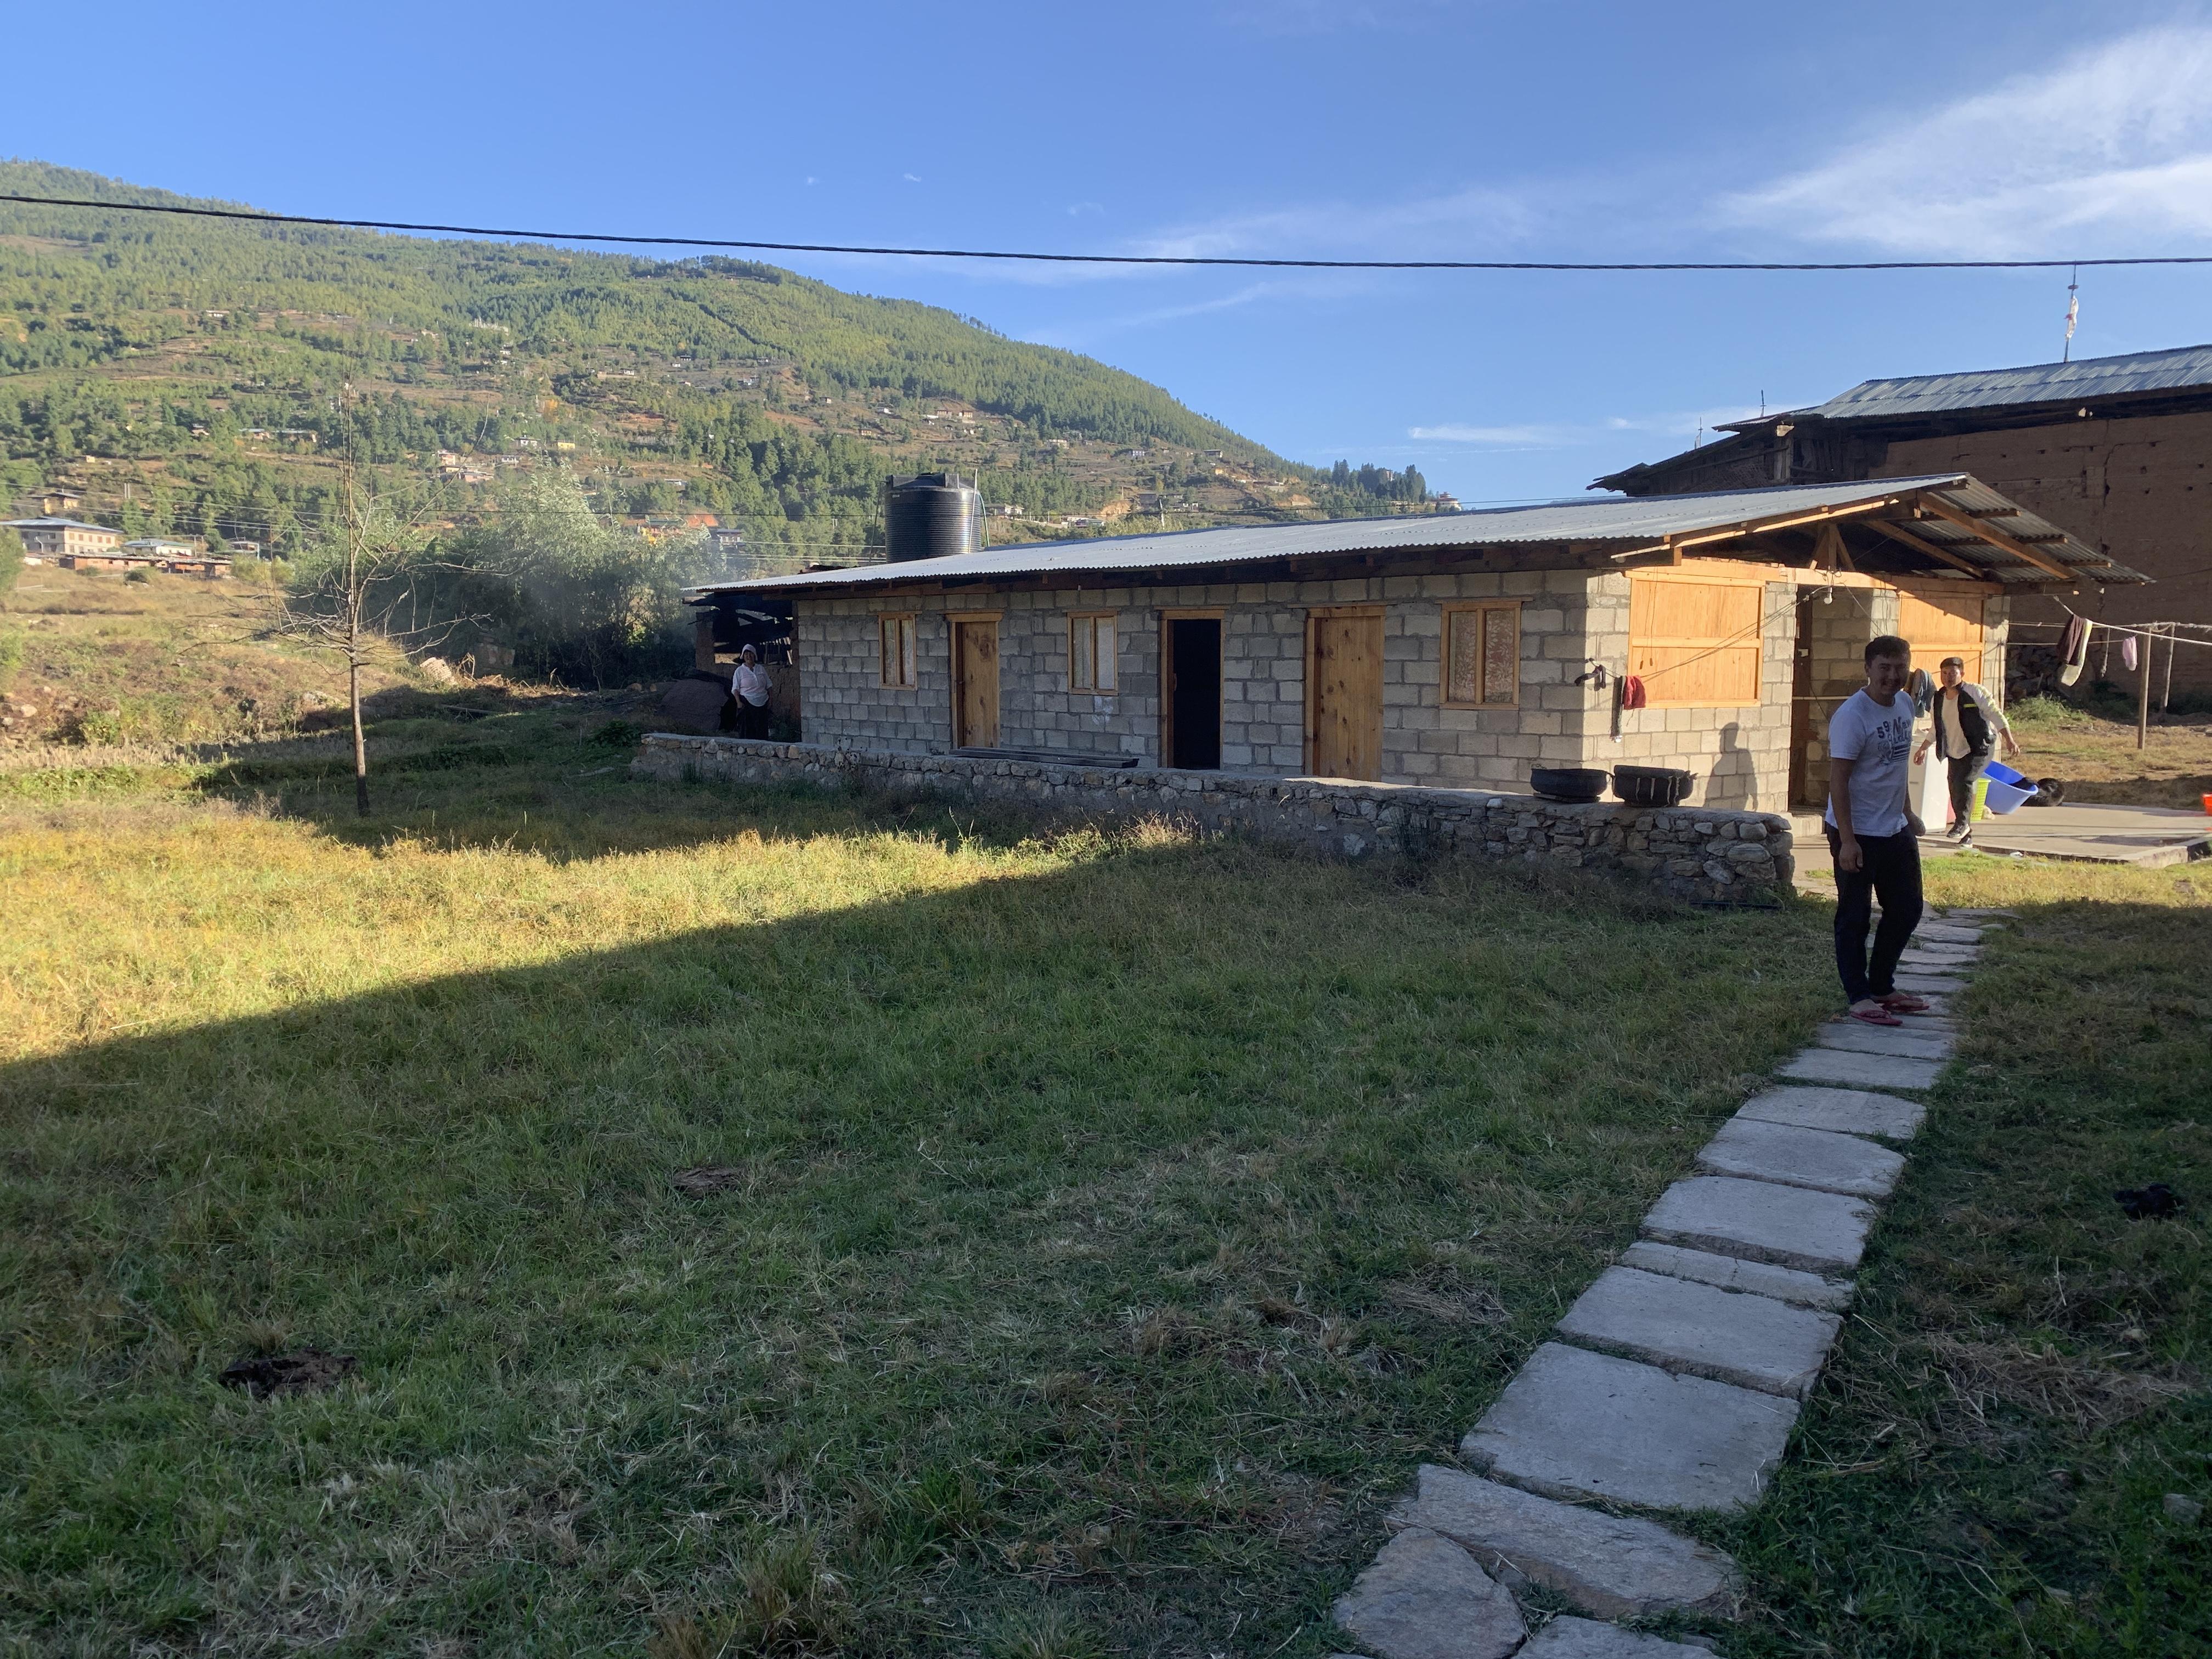 Bhutan Travel Guide6